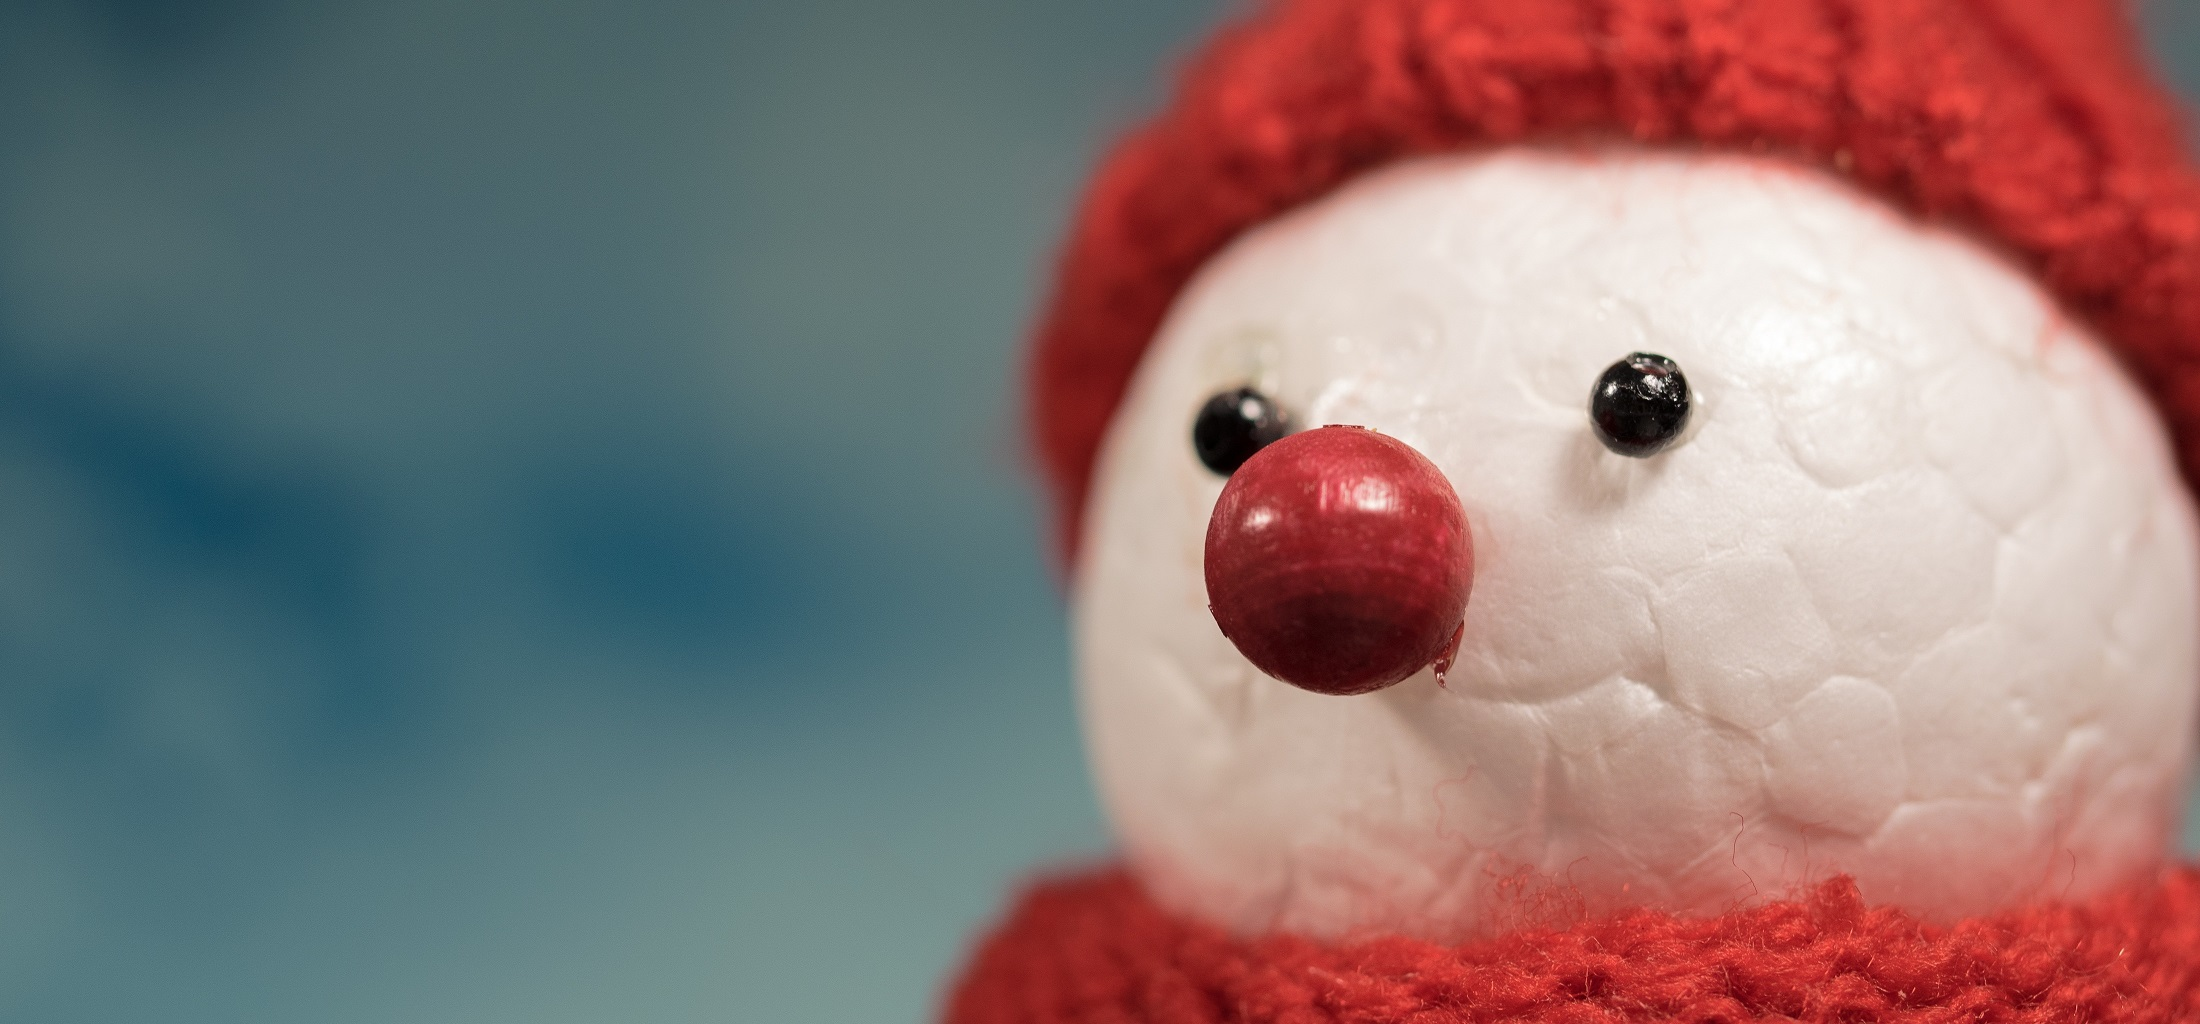 snow-man-winter-cap-cold-39902